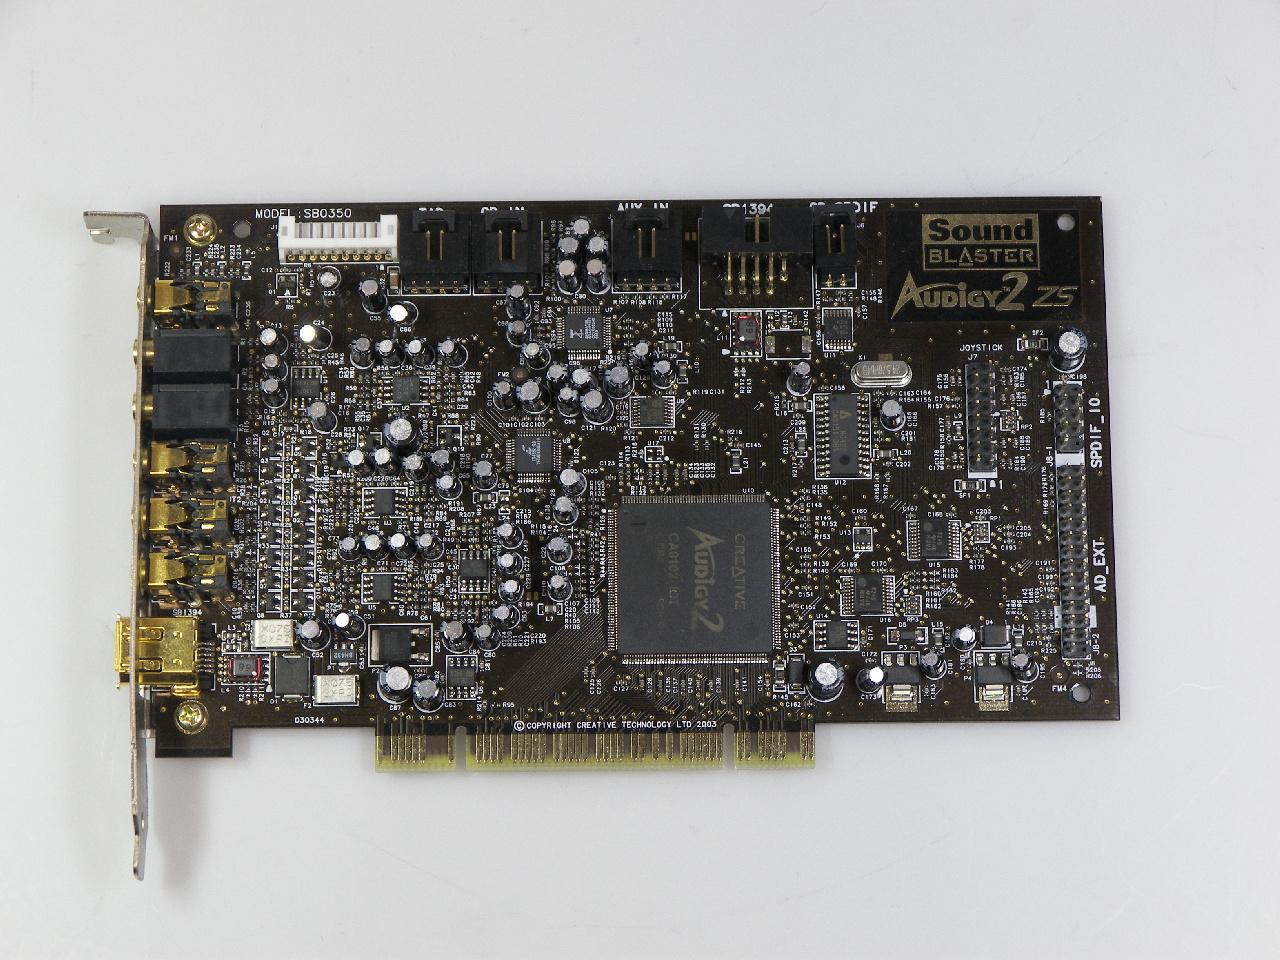 Creative Labs Model SB0090 Sound Blaster Audigy SB1394 Sound Card 10